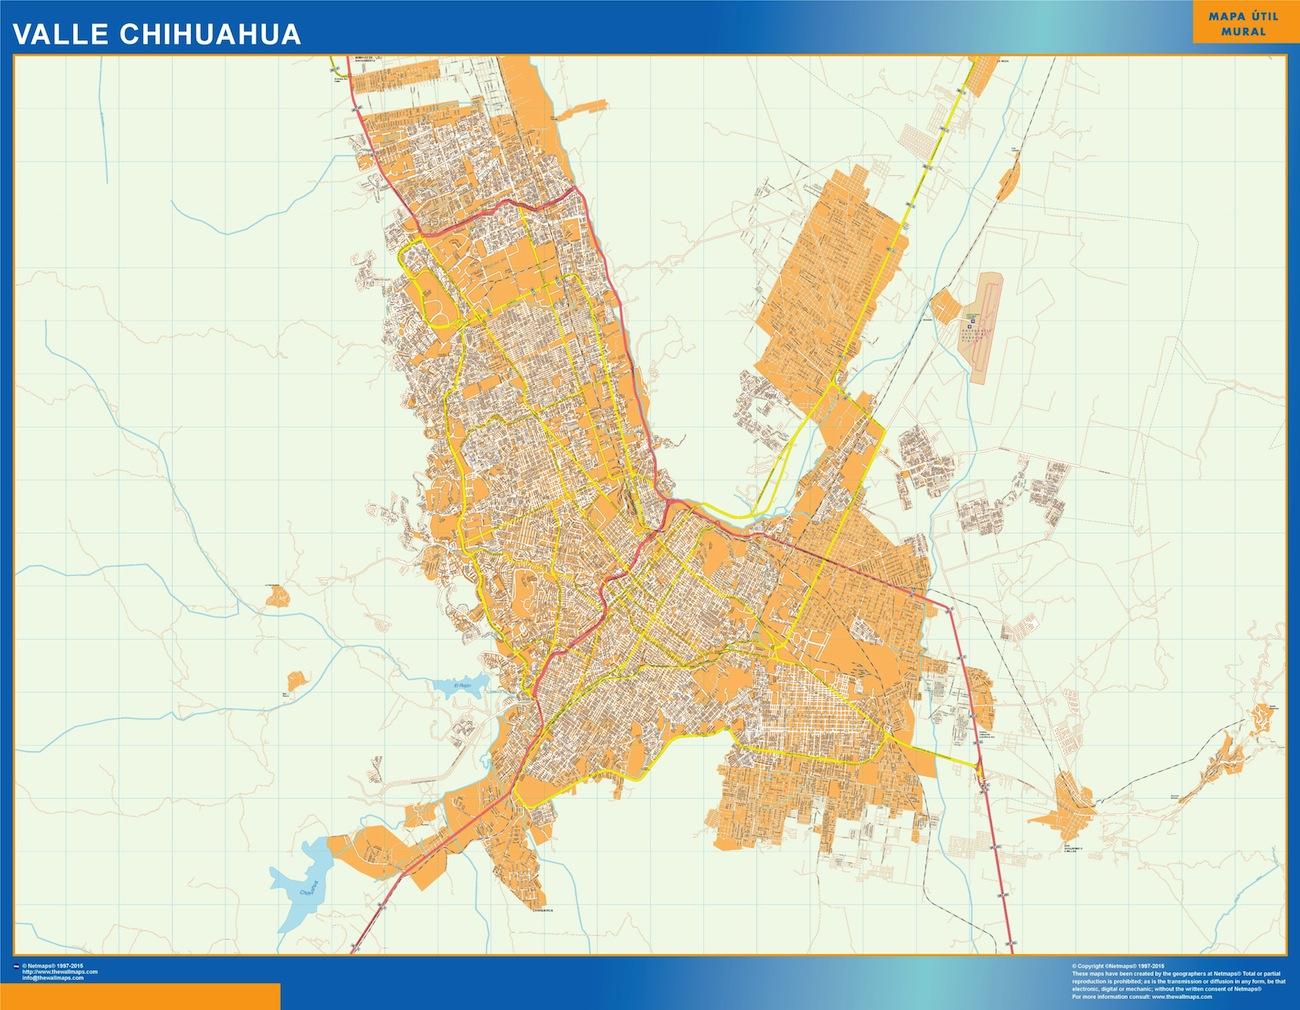 mapa Valle Chihuahua